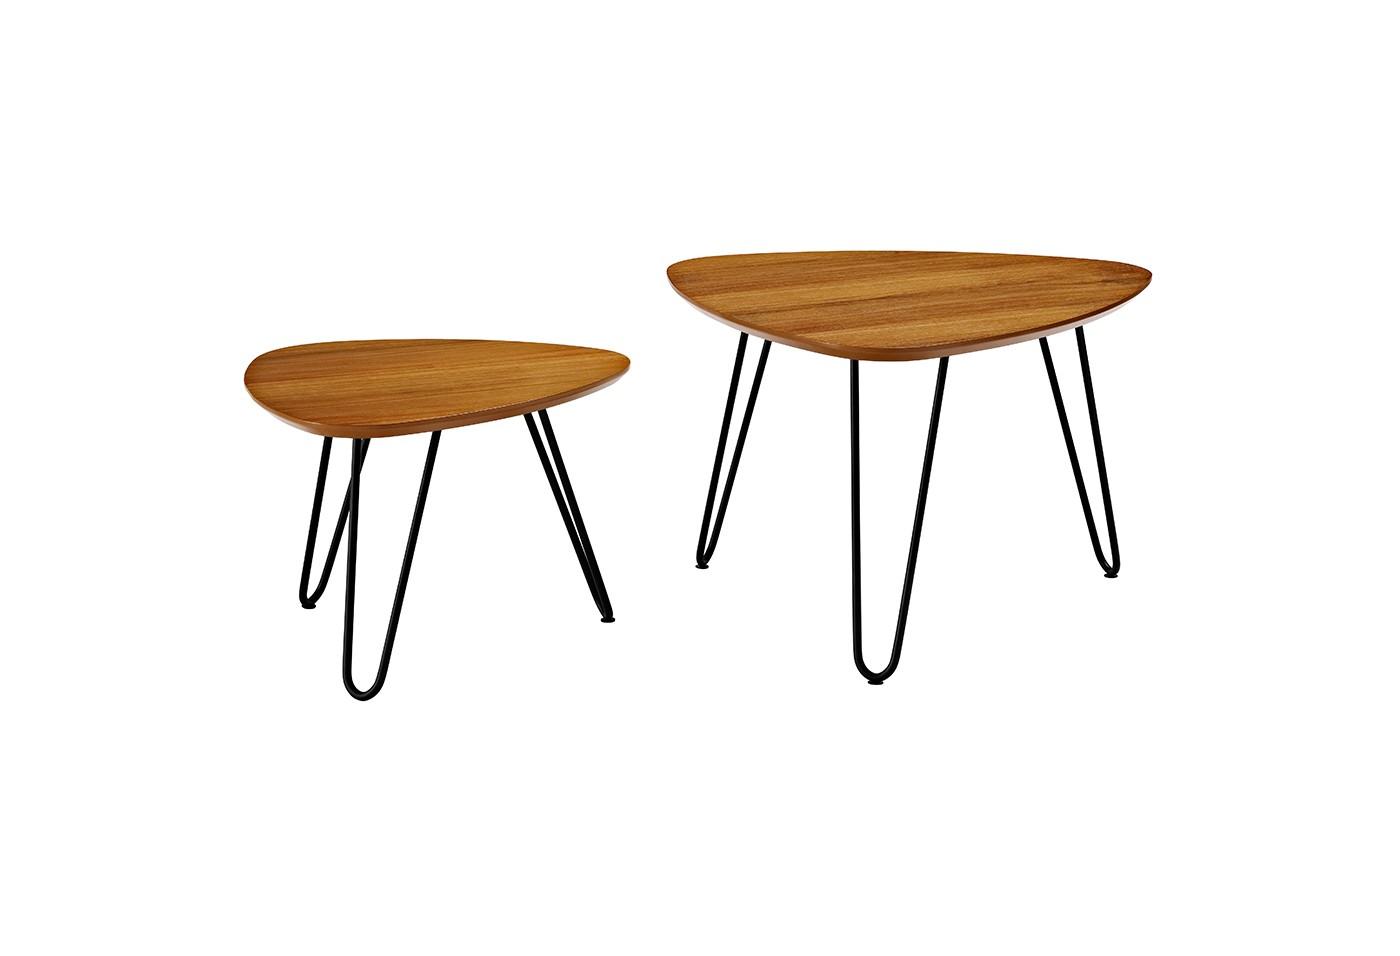 Hairpin Leg Wood Nesting Coffee Table Set - Walnut - Saracina Home - image 2 of 4